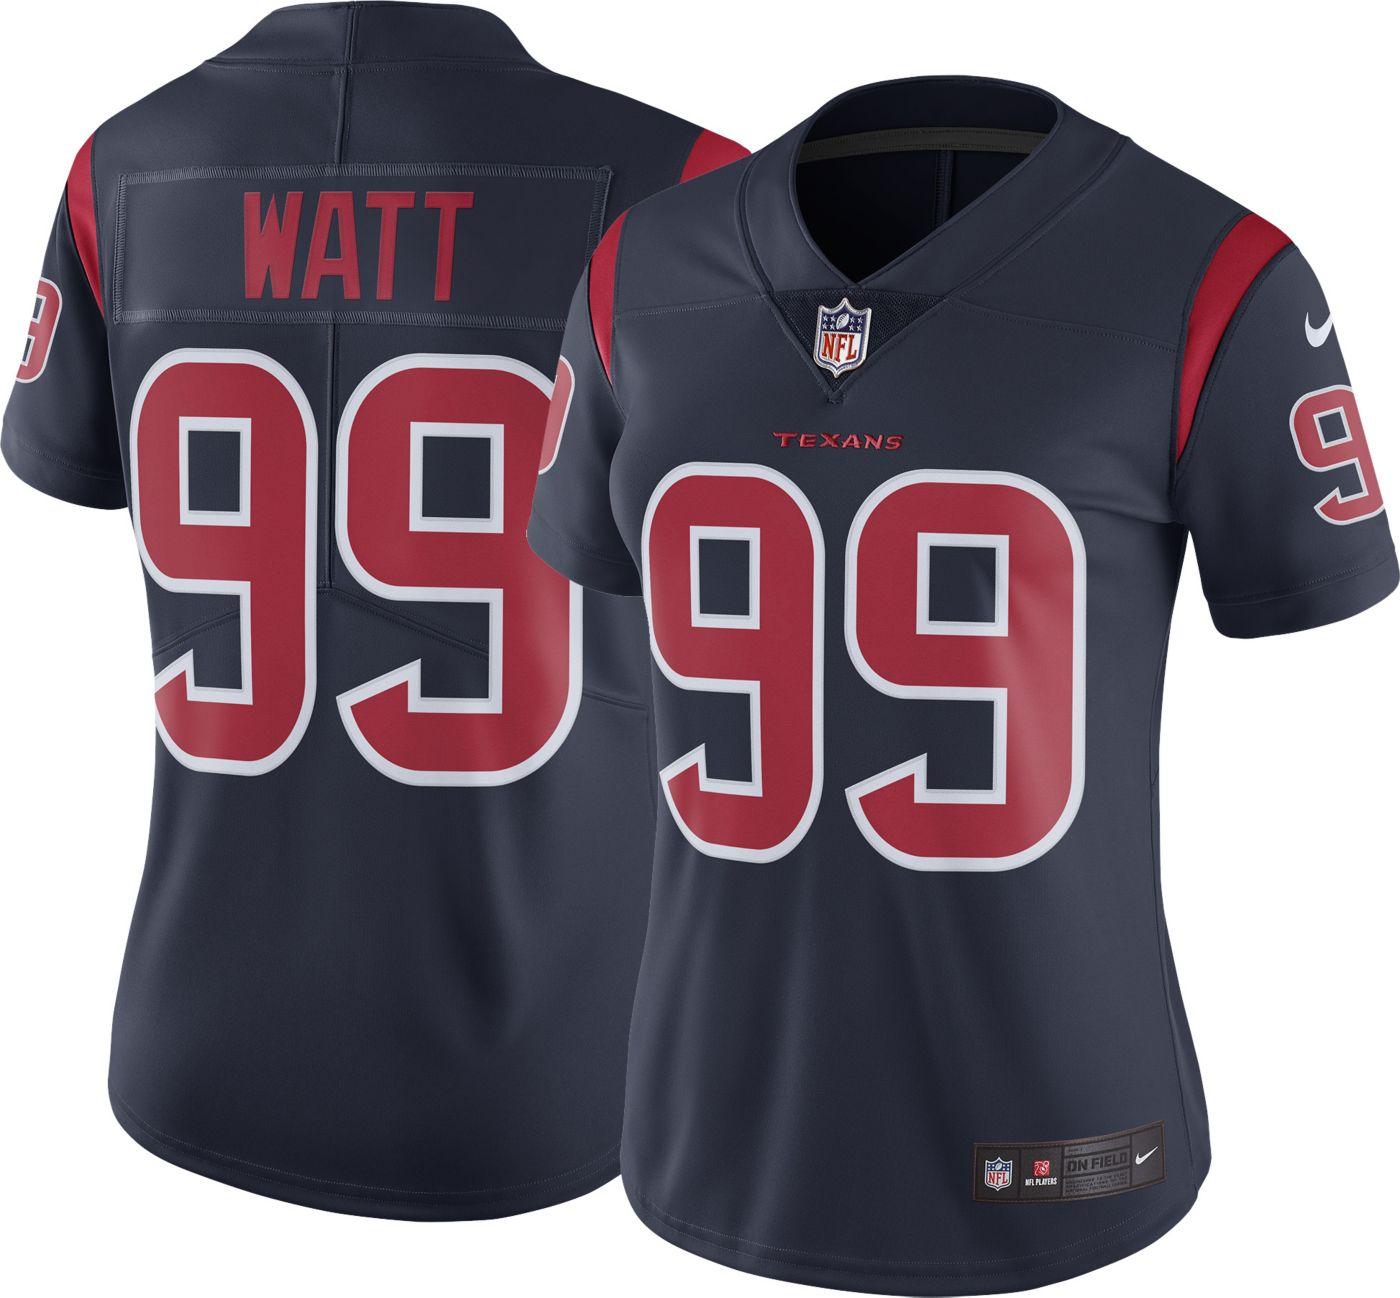 Nike Women's Color Rush Limited Jersey Houston Texans J.J. Watt #99